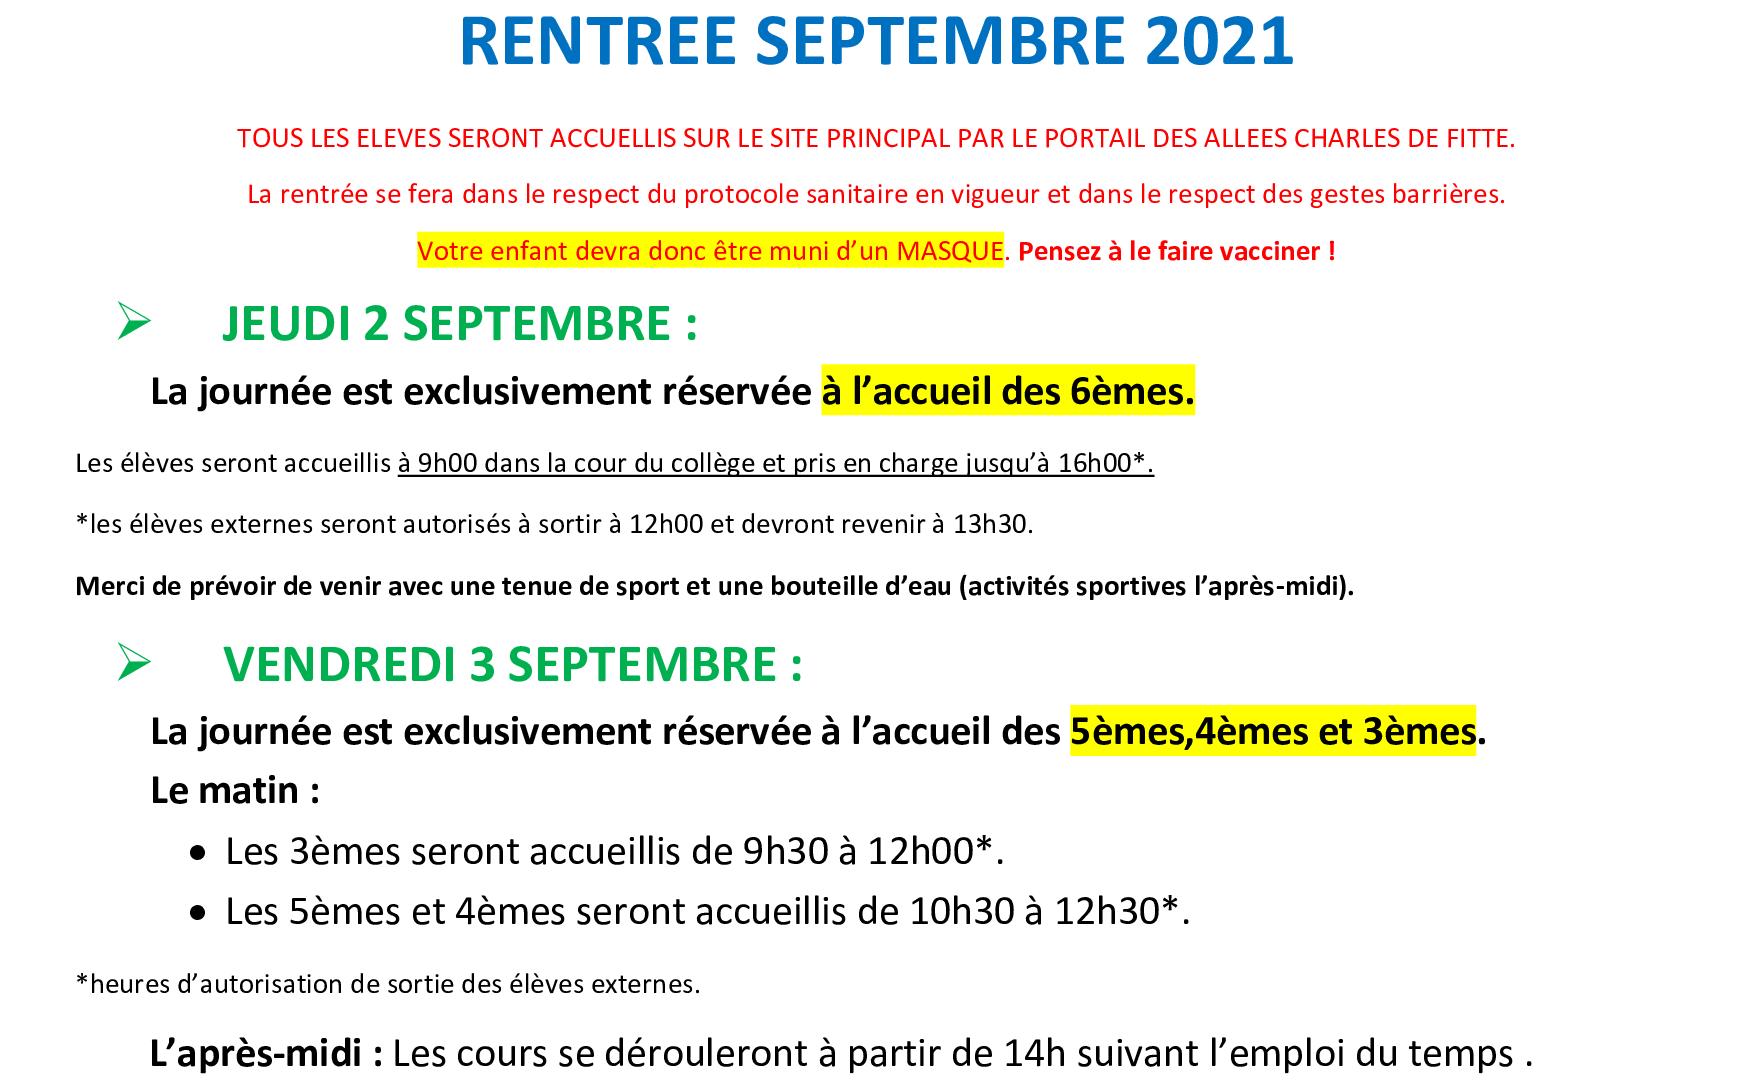 RENTREE SEPTEMBRE 2021-_001.png